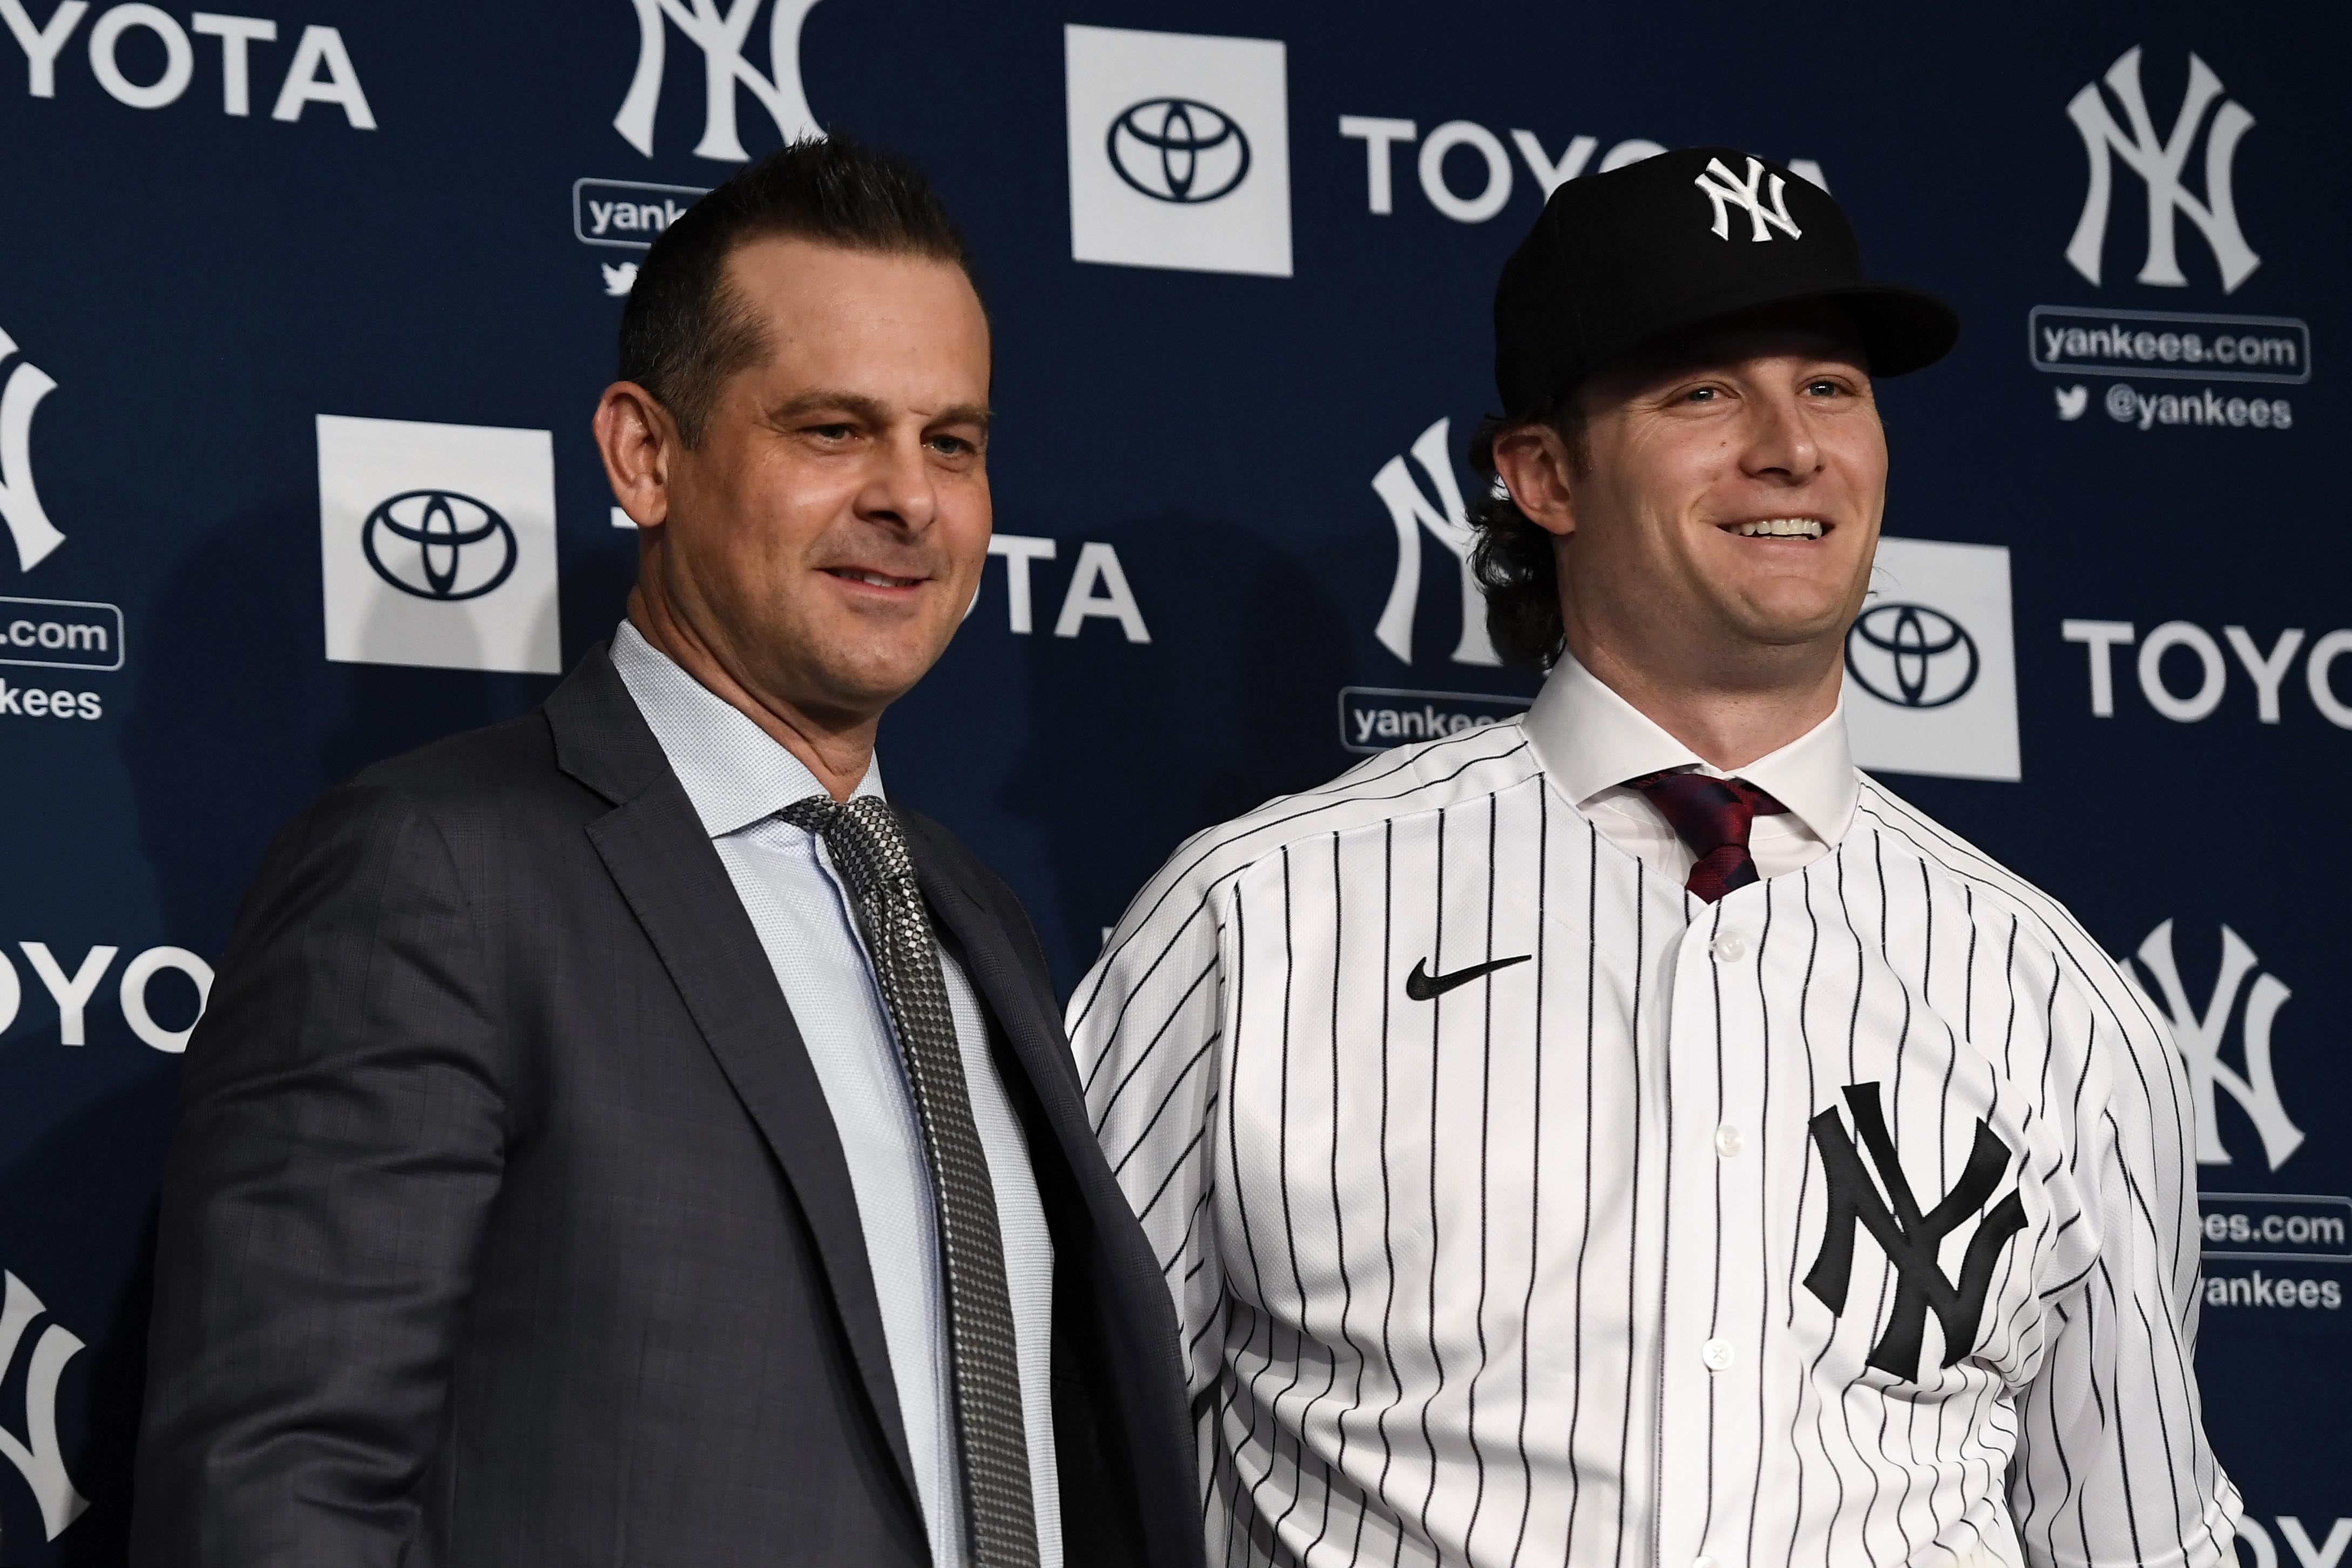 New York Yankees, Aaron Boone, Gerrit Cole